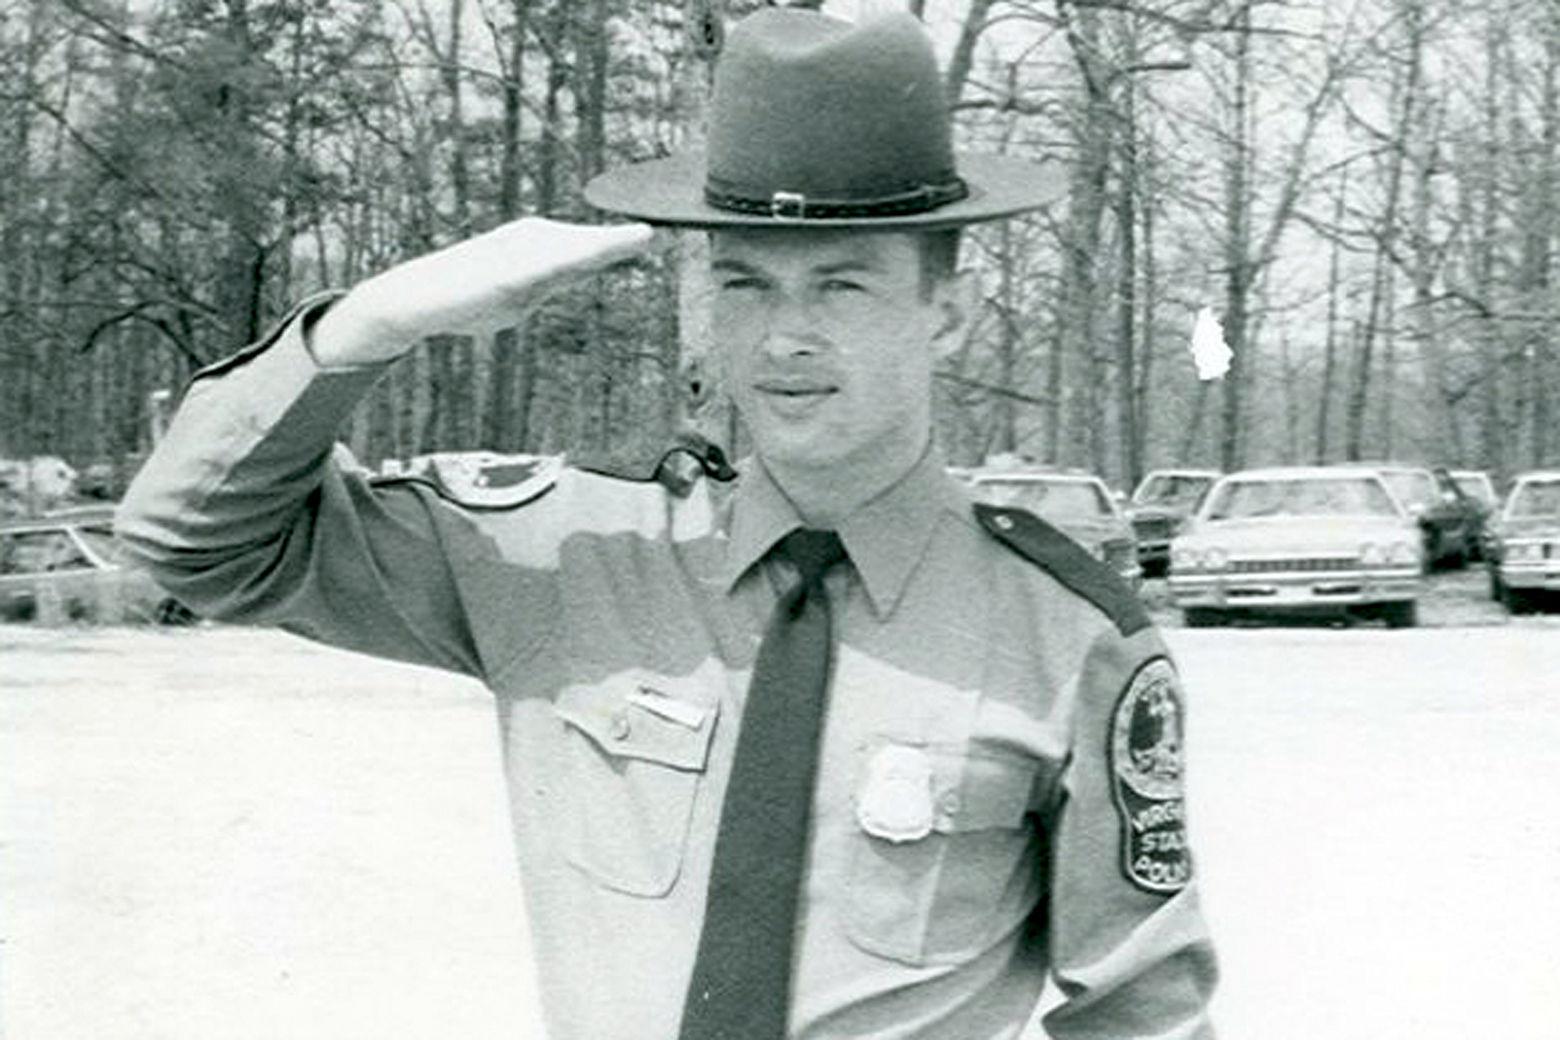 Undated photo of Virginia State Trooper Johnny Rush Bowman. (Courtesy FBI)